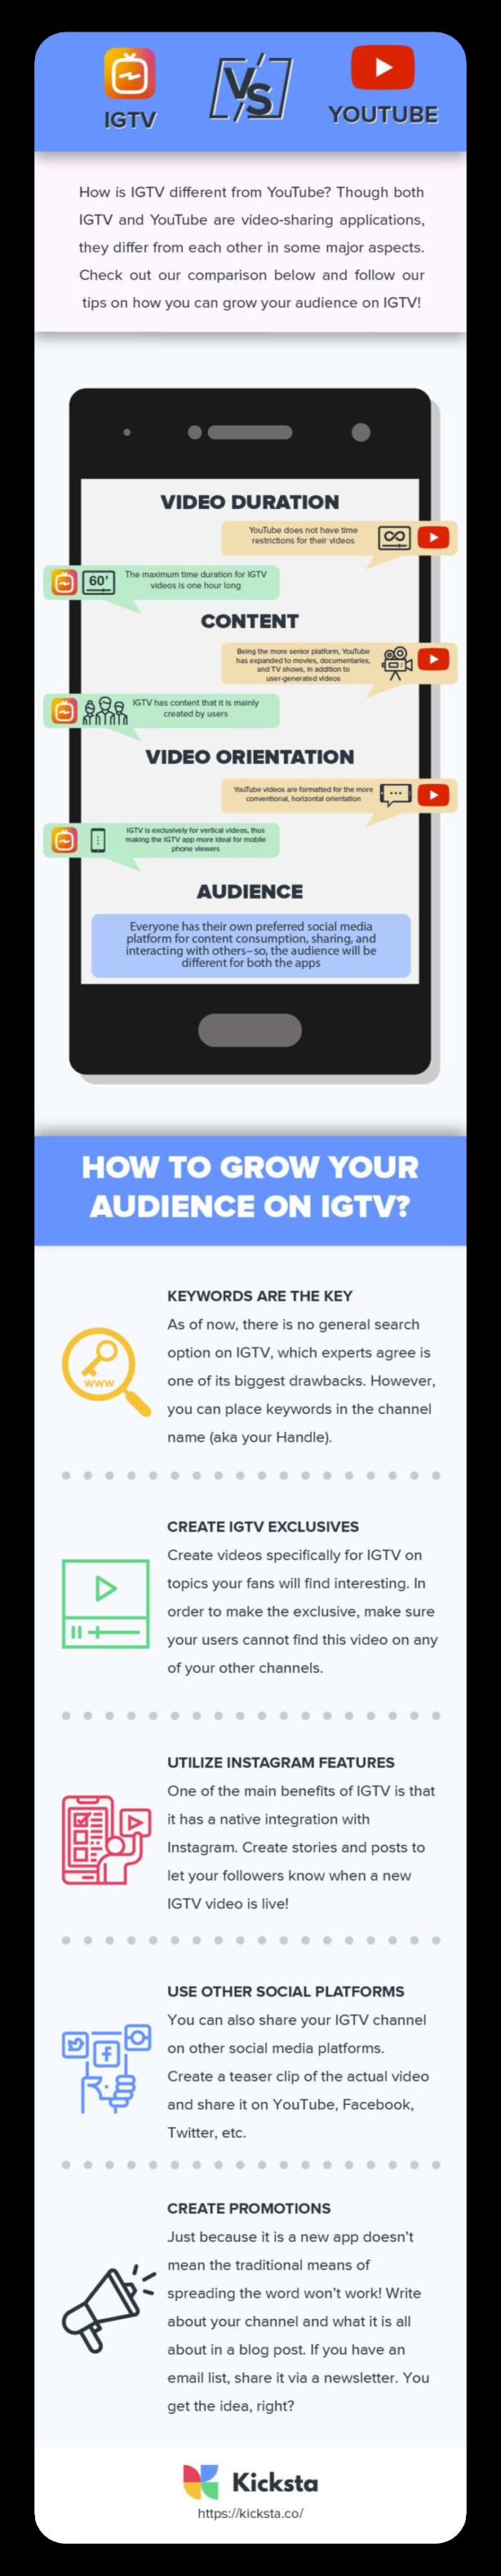 IGTV vs YouTube Infographic